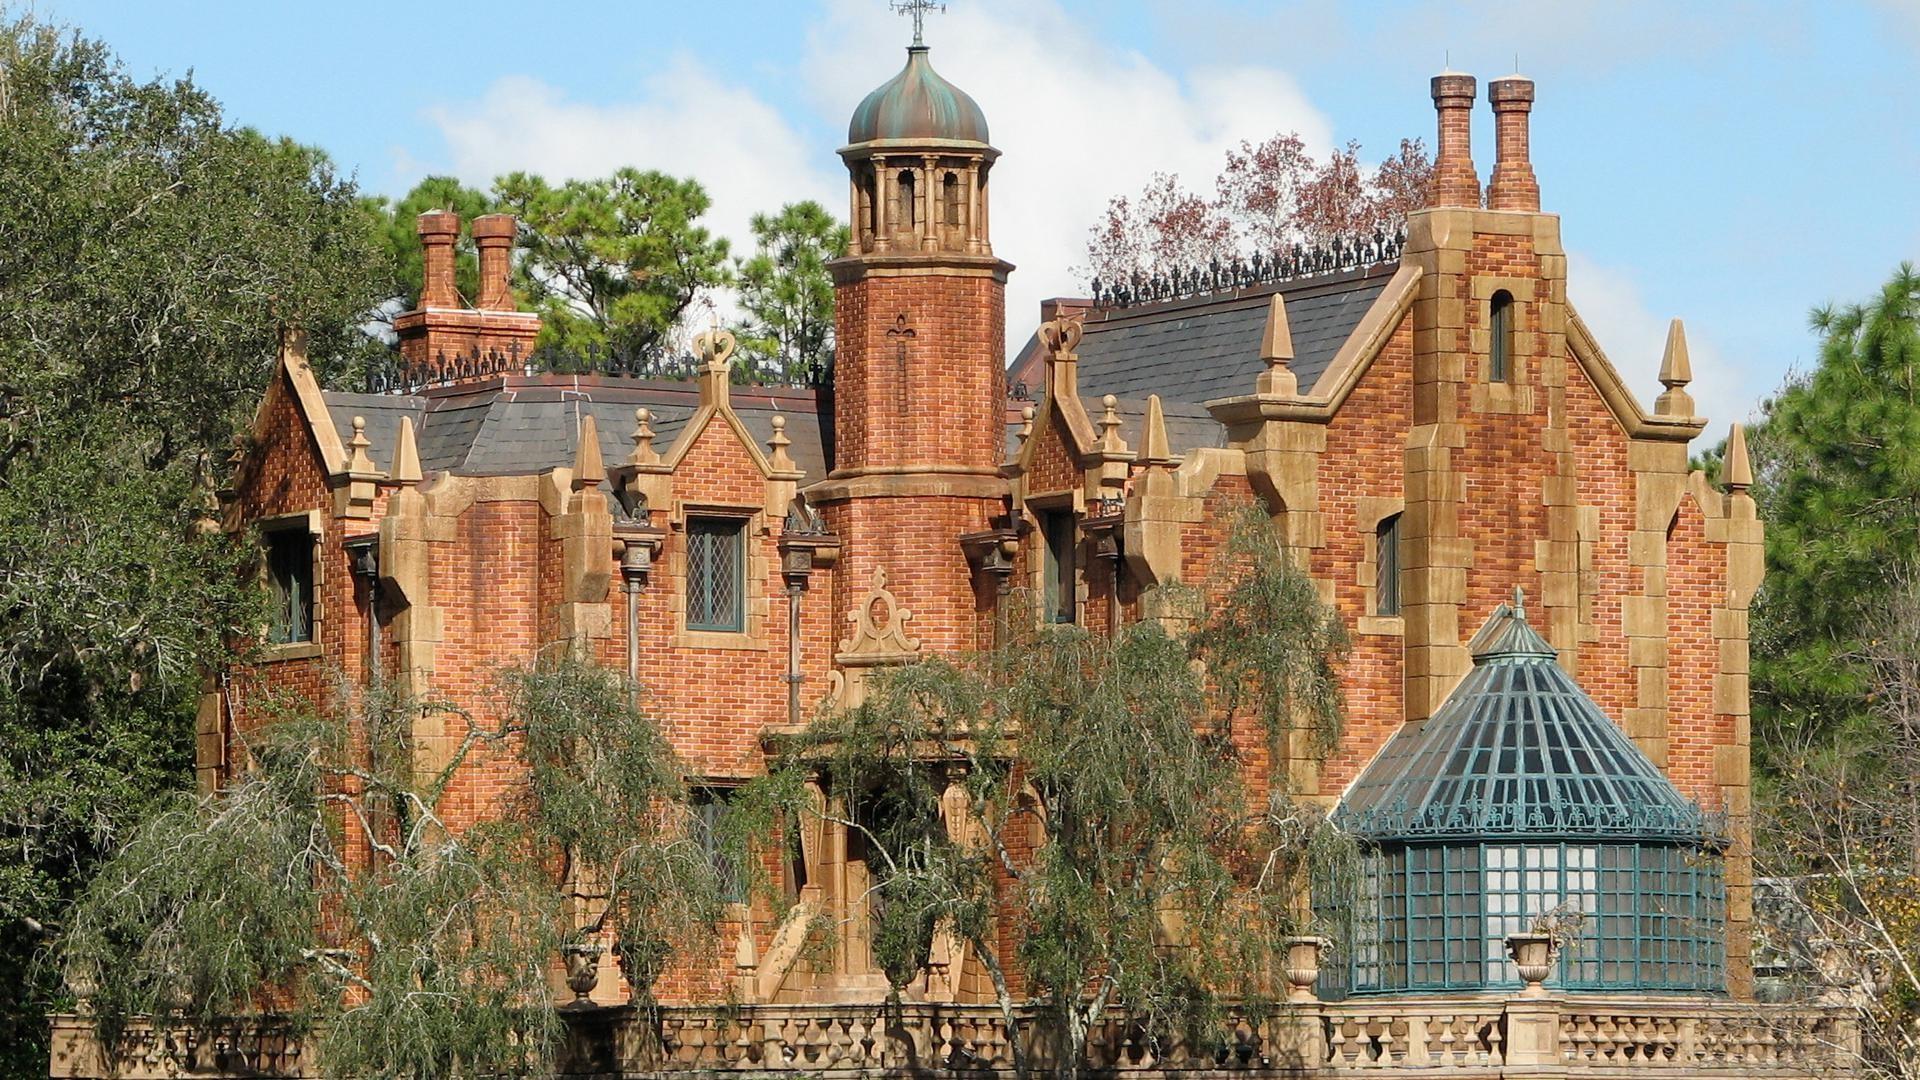 Disney World Haunted Mansion Wallpaper (67+ images)